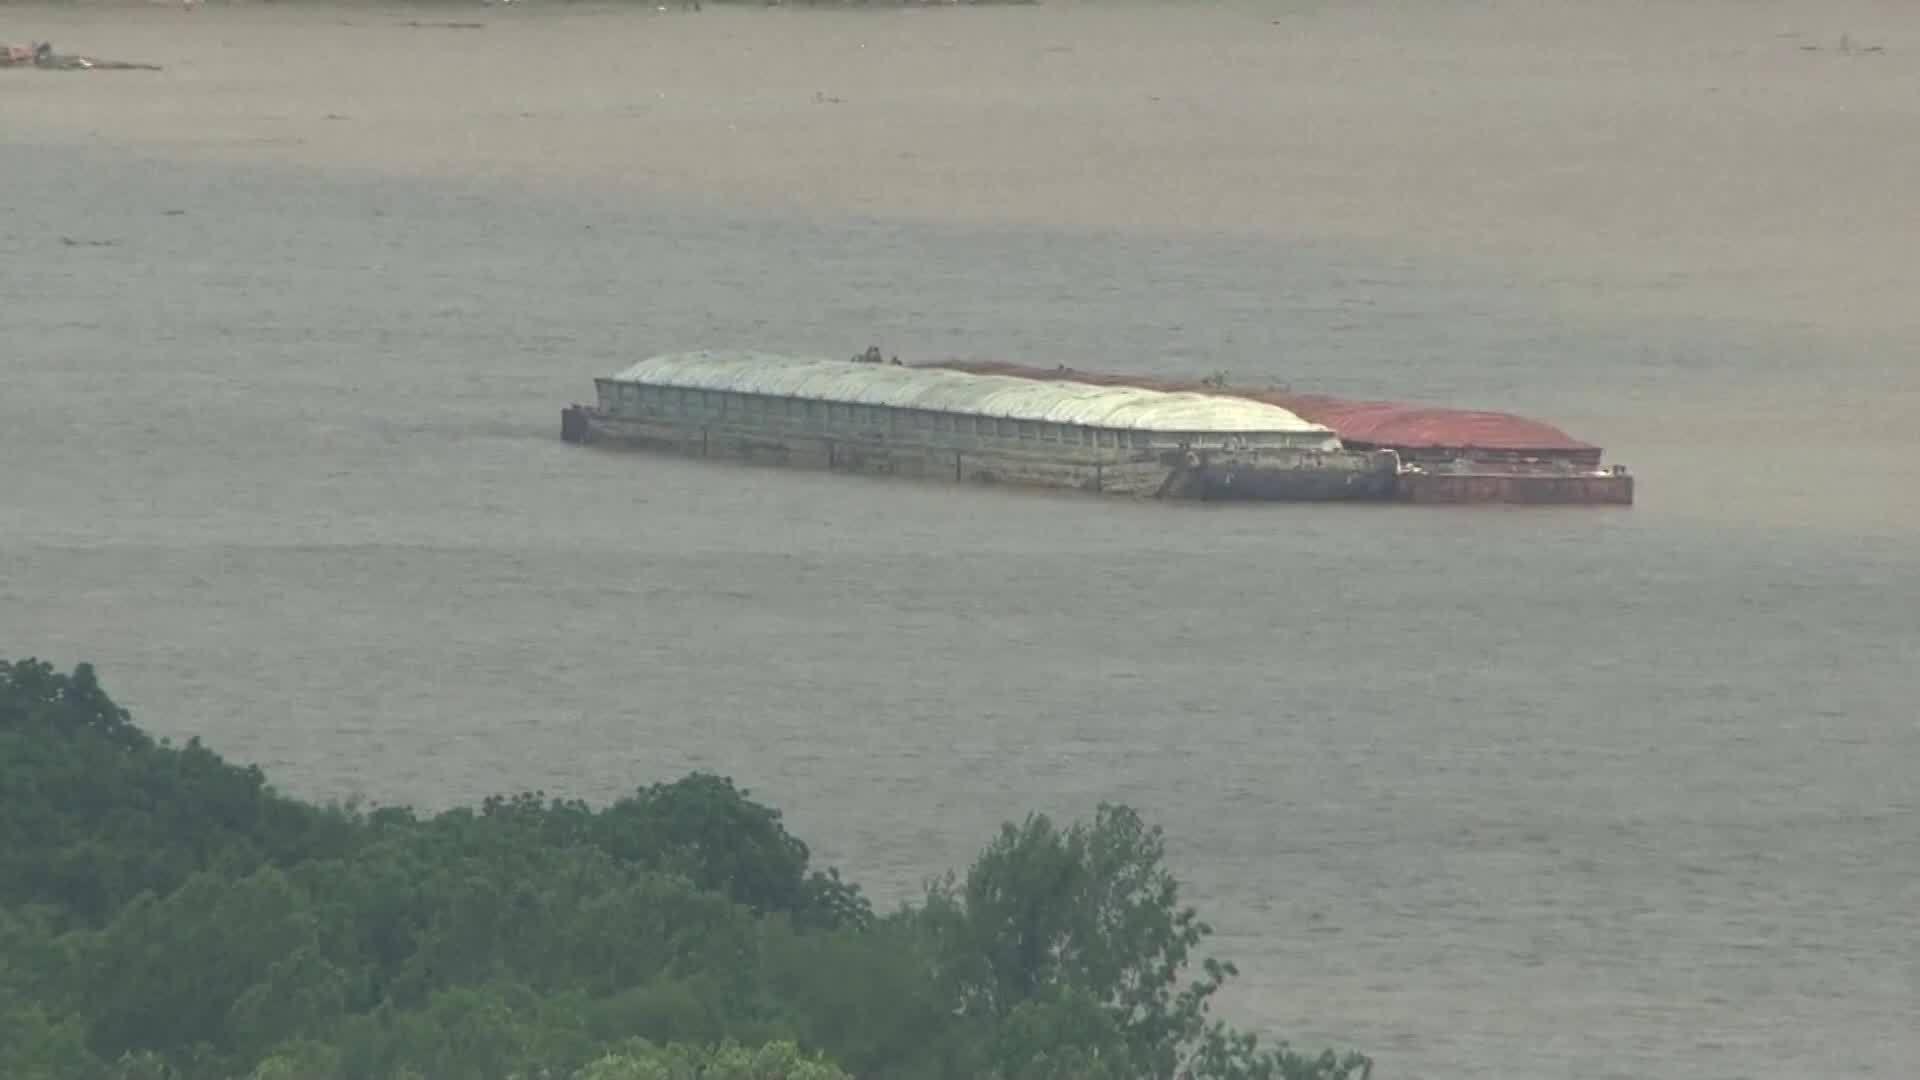 Barges loose on Arkansas River near Webbers Falls, Oklahoma headed toward Lock and Dam.